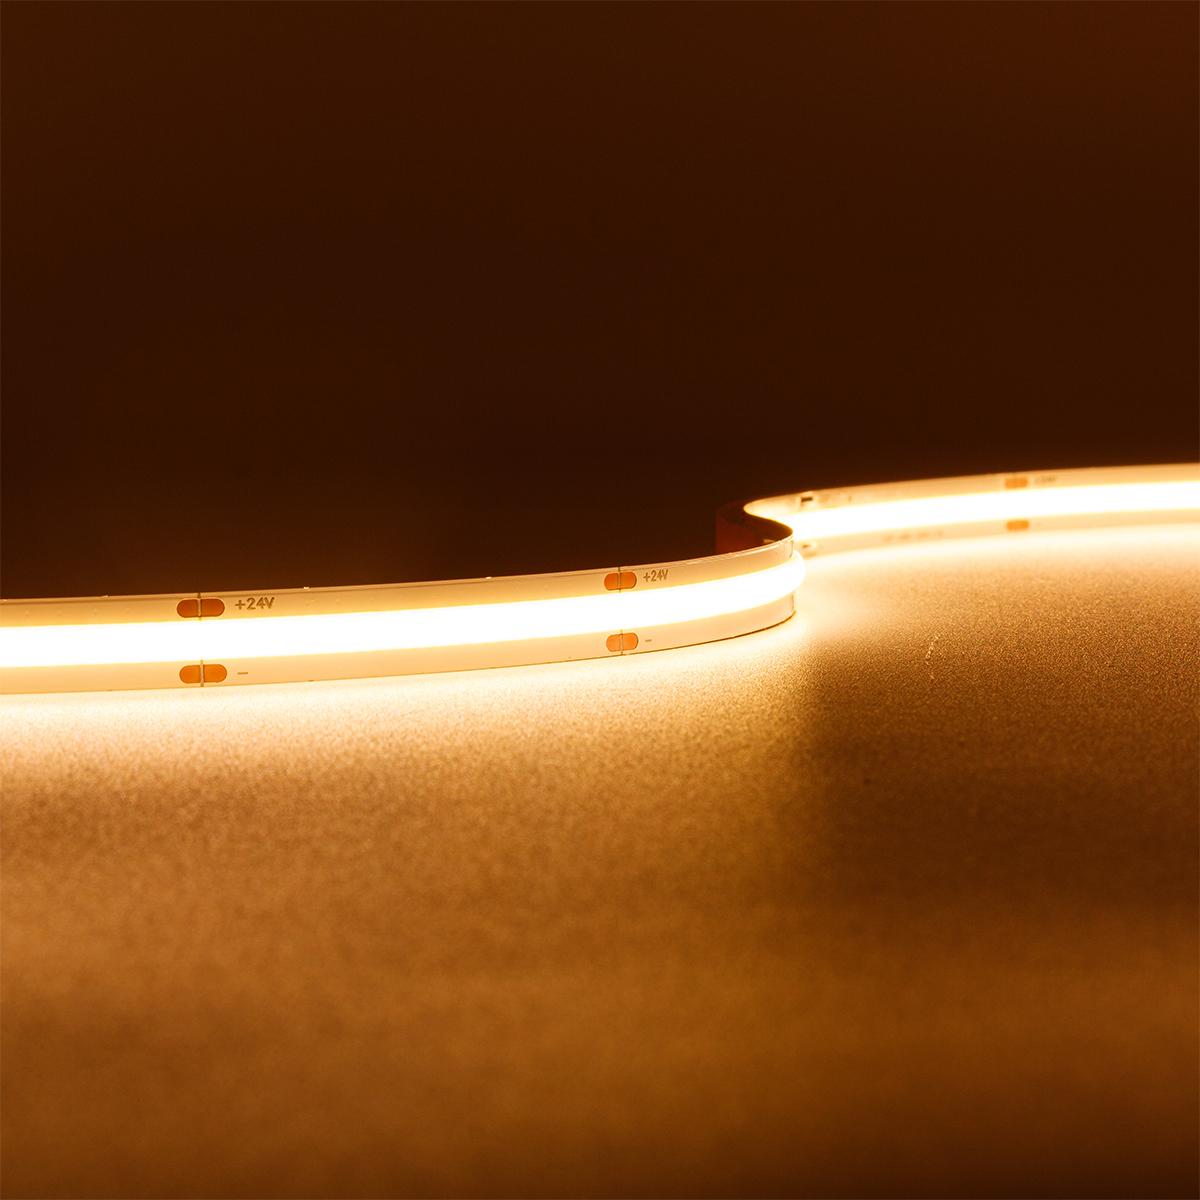 COB Warmweiß 24V CRI90 LED Streifen 5M 14W/m 504LED/m 10mm IP20 2700K